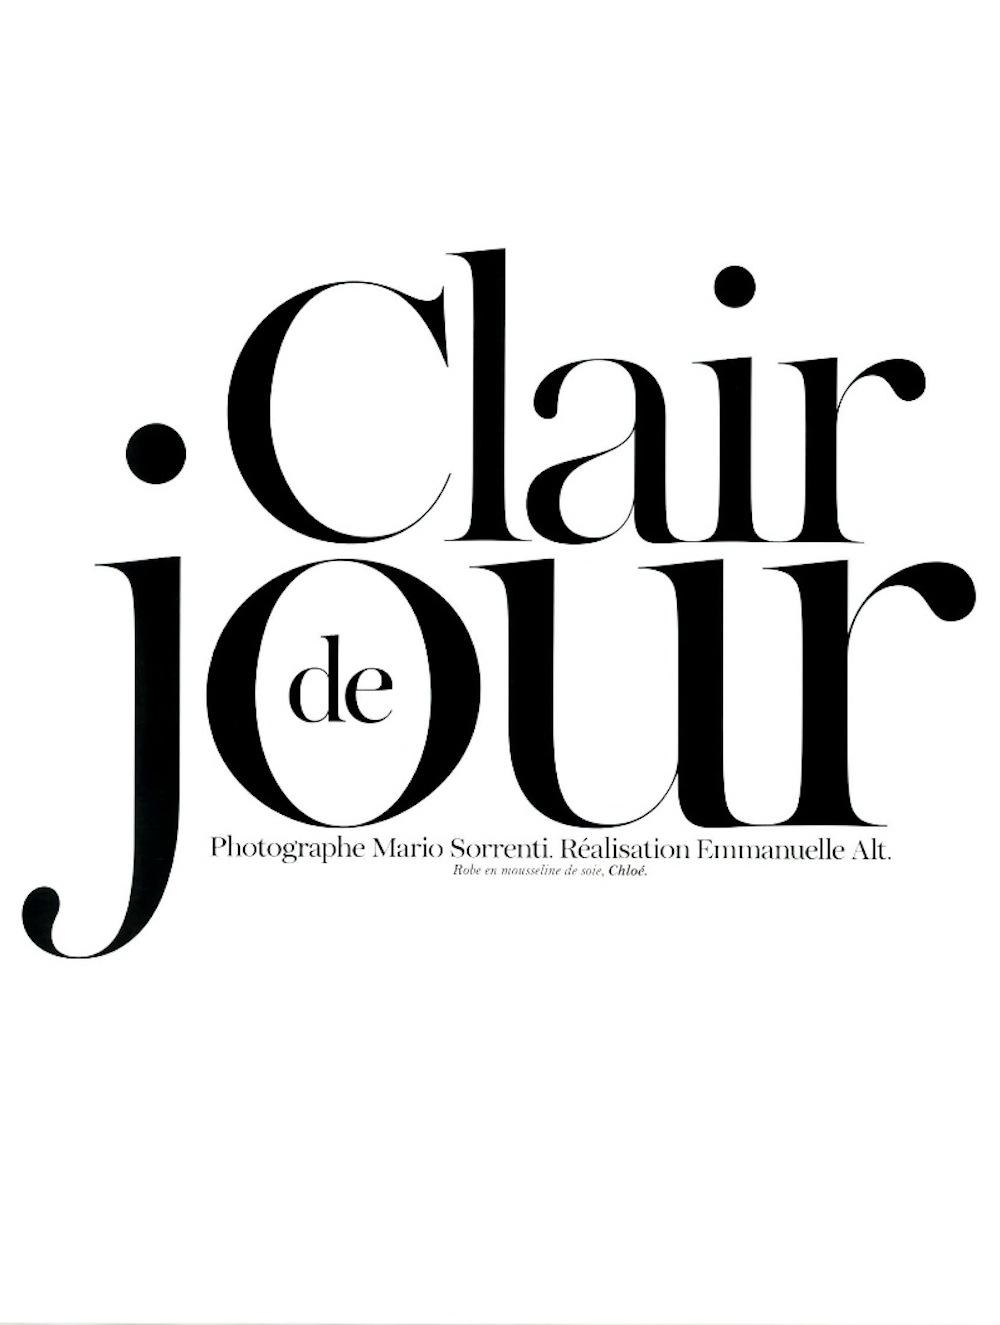 clair de jour natasha poly by mario sorrenti for vogue paris june july 2012 visual optimism. Black Bedroom Furniture Sets. Home Design Ideas